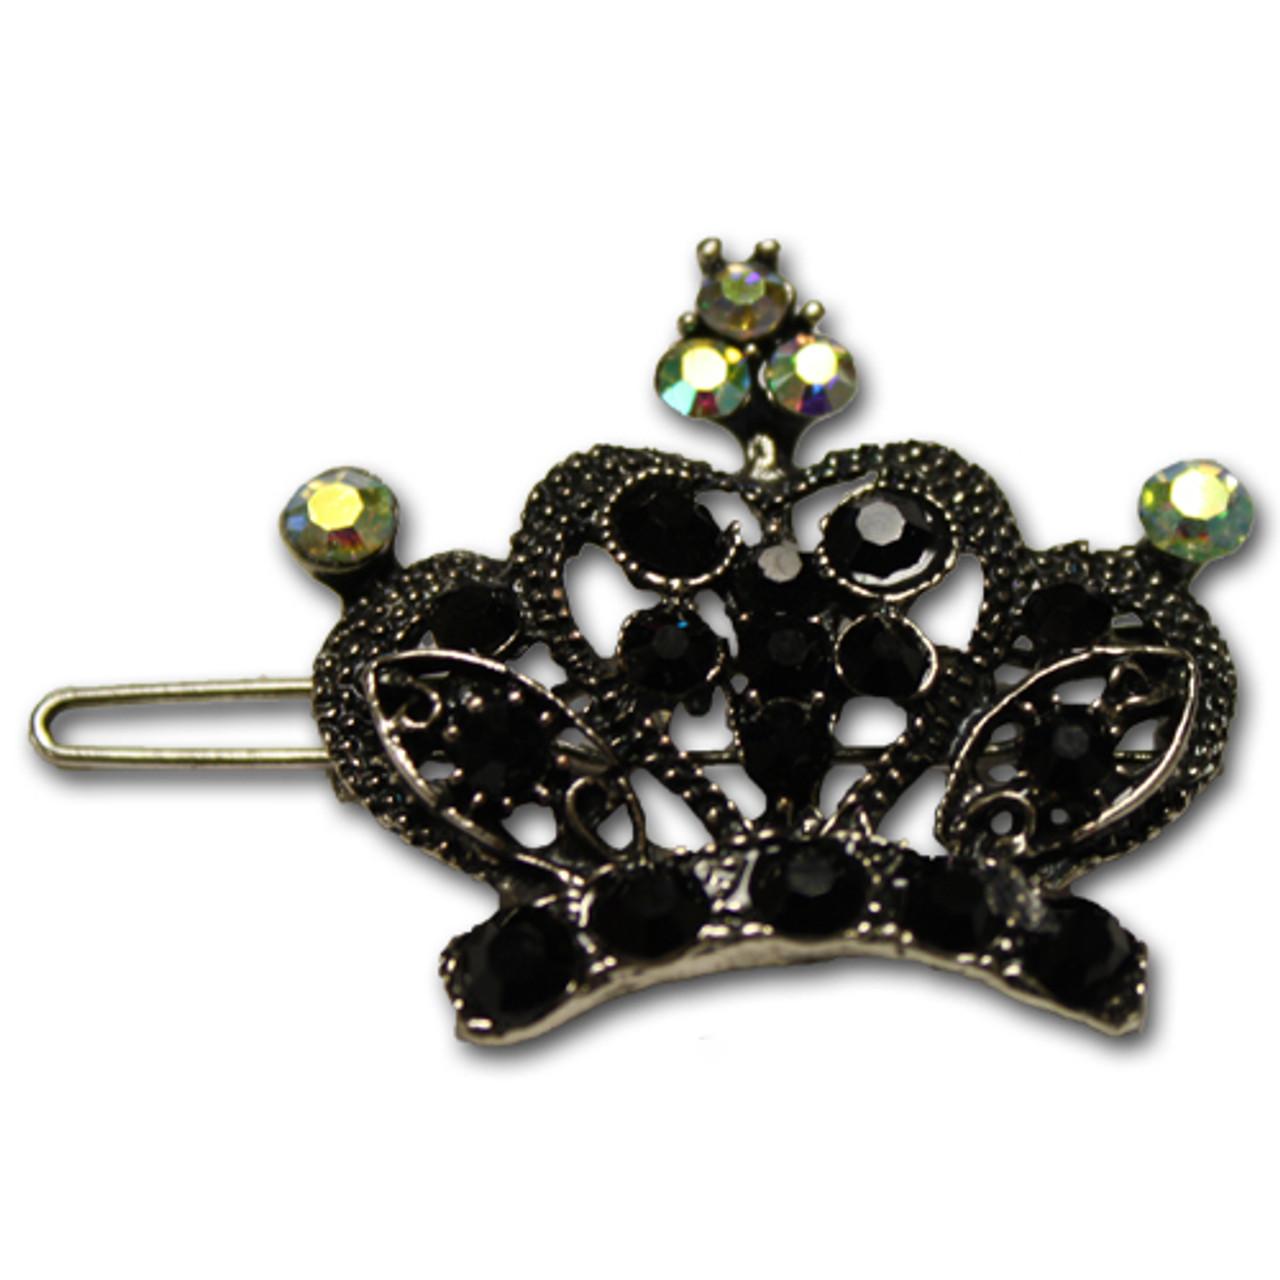 Princess crown barrette